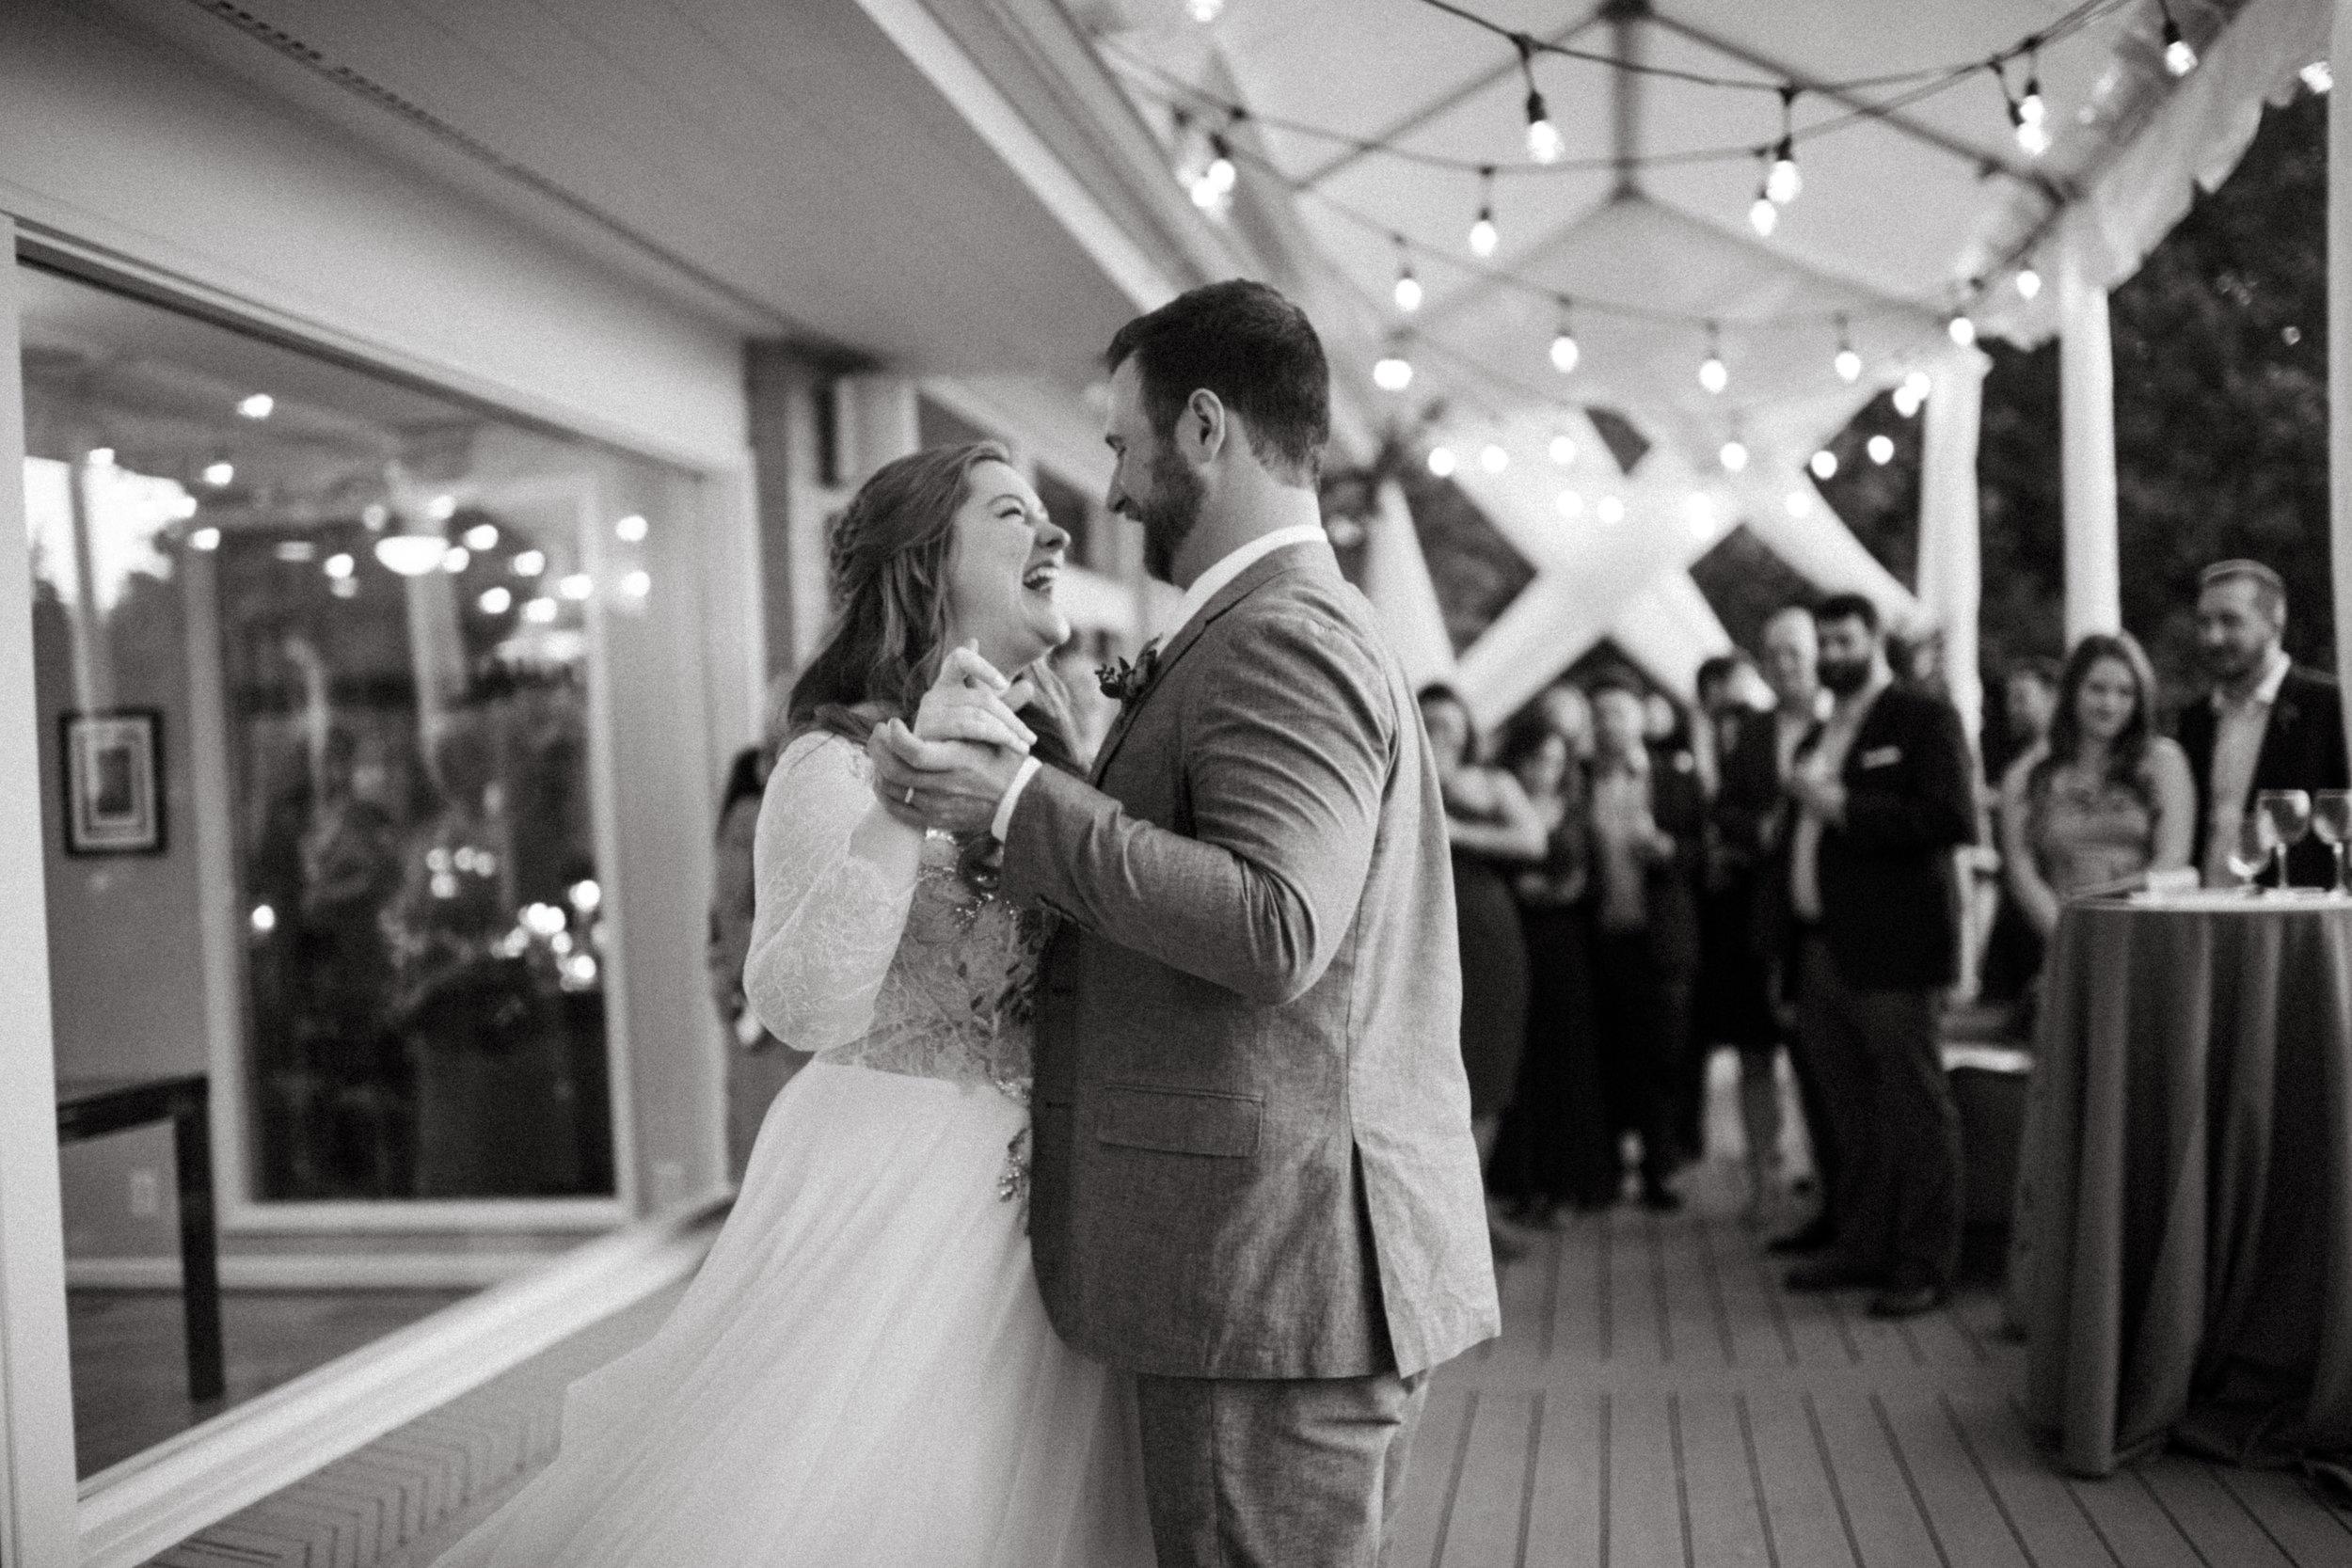 Elizabeth and Aldens Intimate Backyard wedding in Nashville Tennessee Wedding Photographer00021.jpg